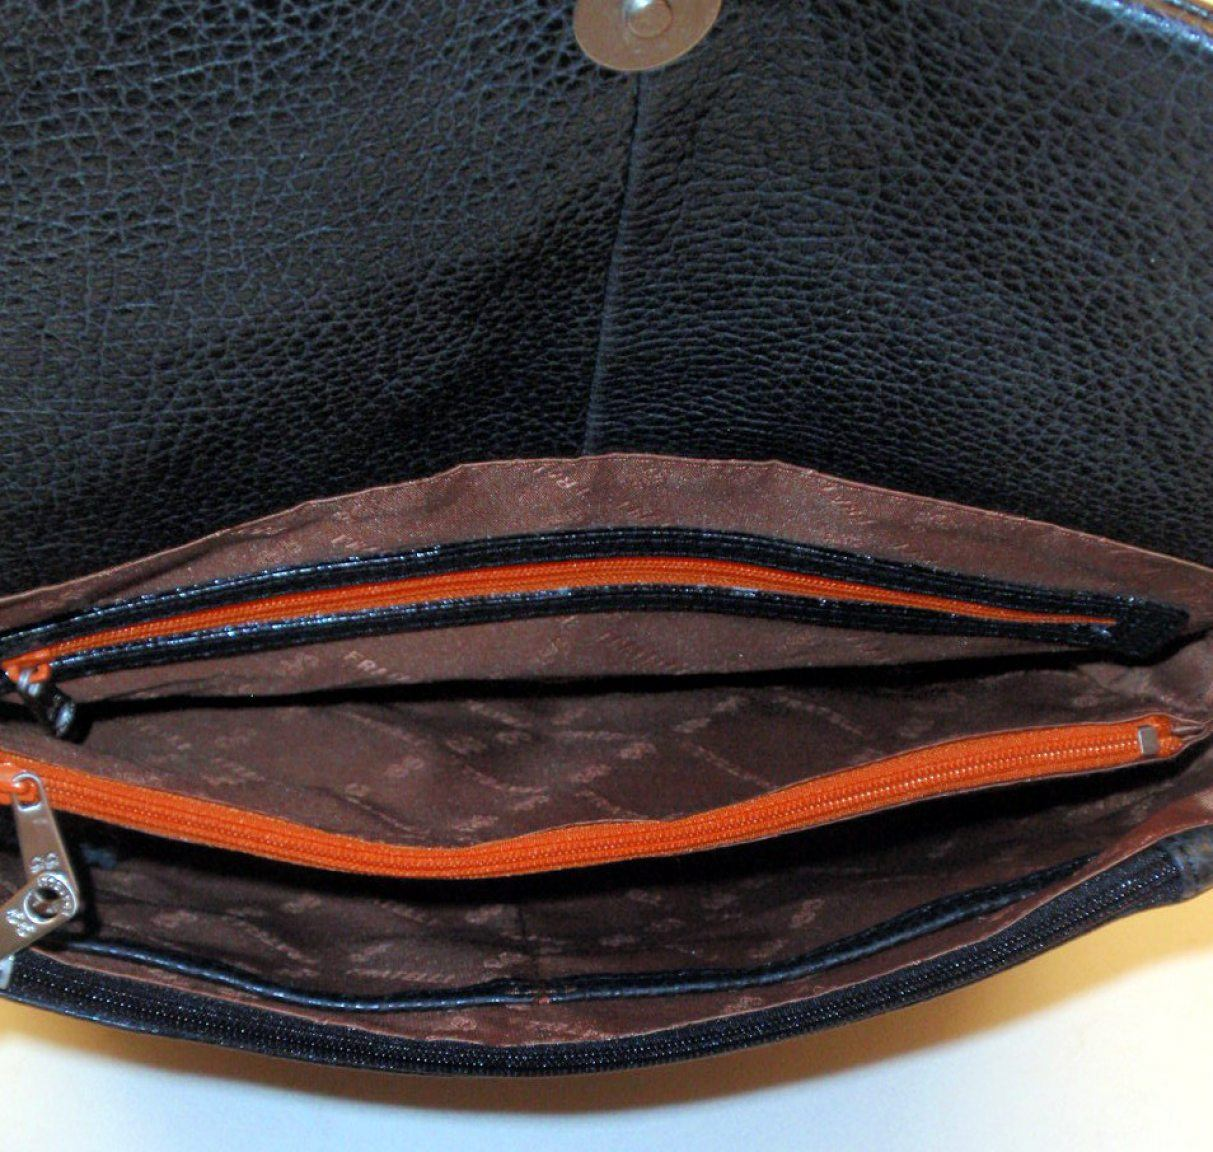 GiGi Fratelli Überschlagtasche Leder noci